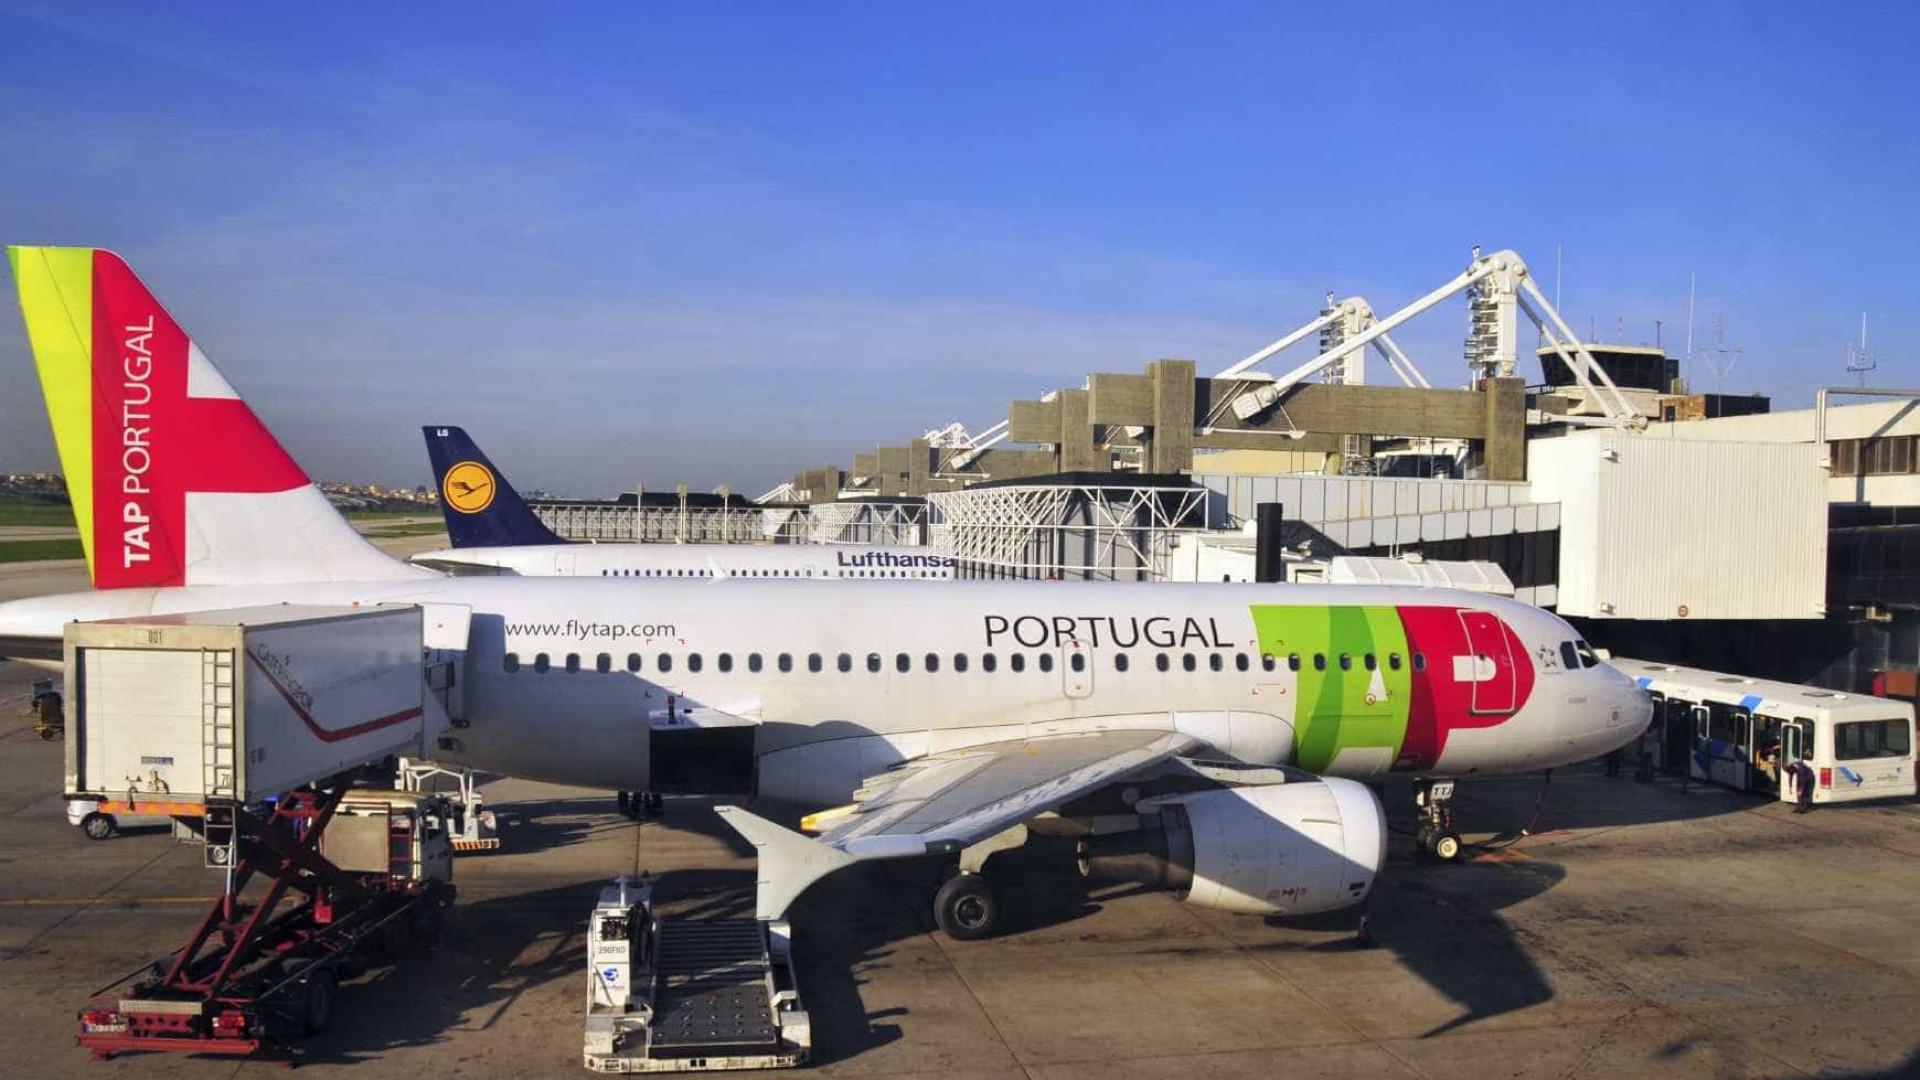 Bagagens de passageiros da TAP regressam a Lisboa após avaria